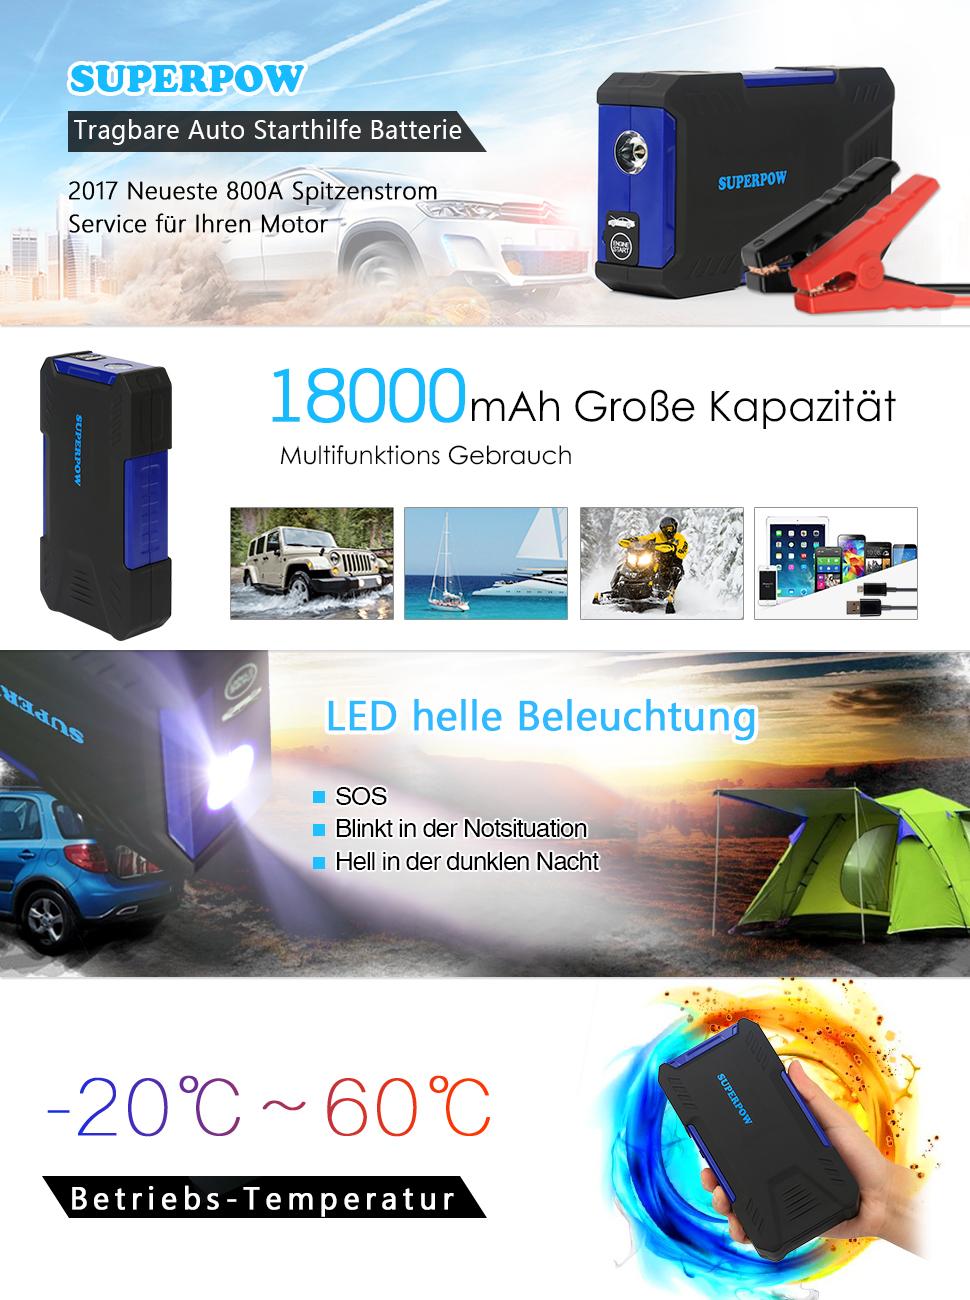 leelbox tragbare auto starthilfe batterie 800a 18000mah. Black Bedroom Furniture Sets. Home Design Ideas